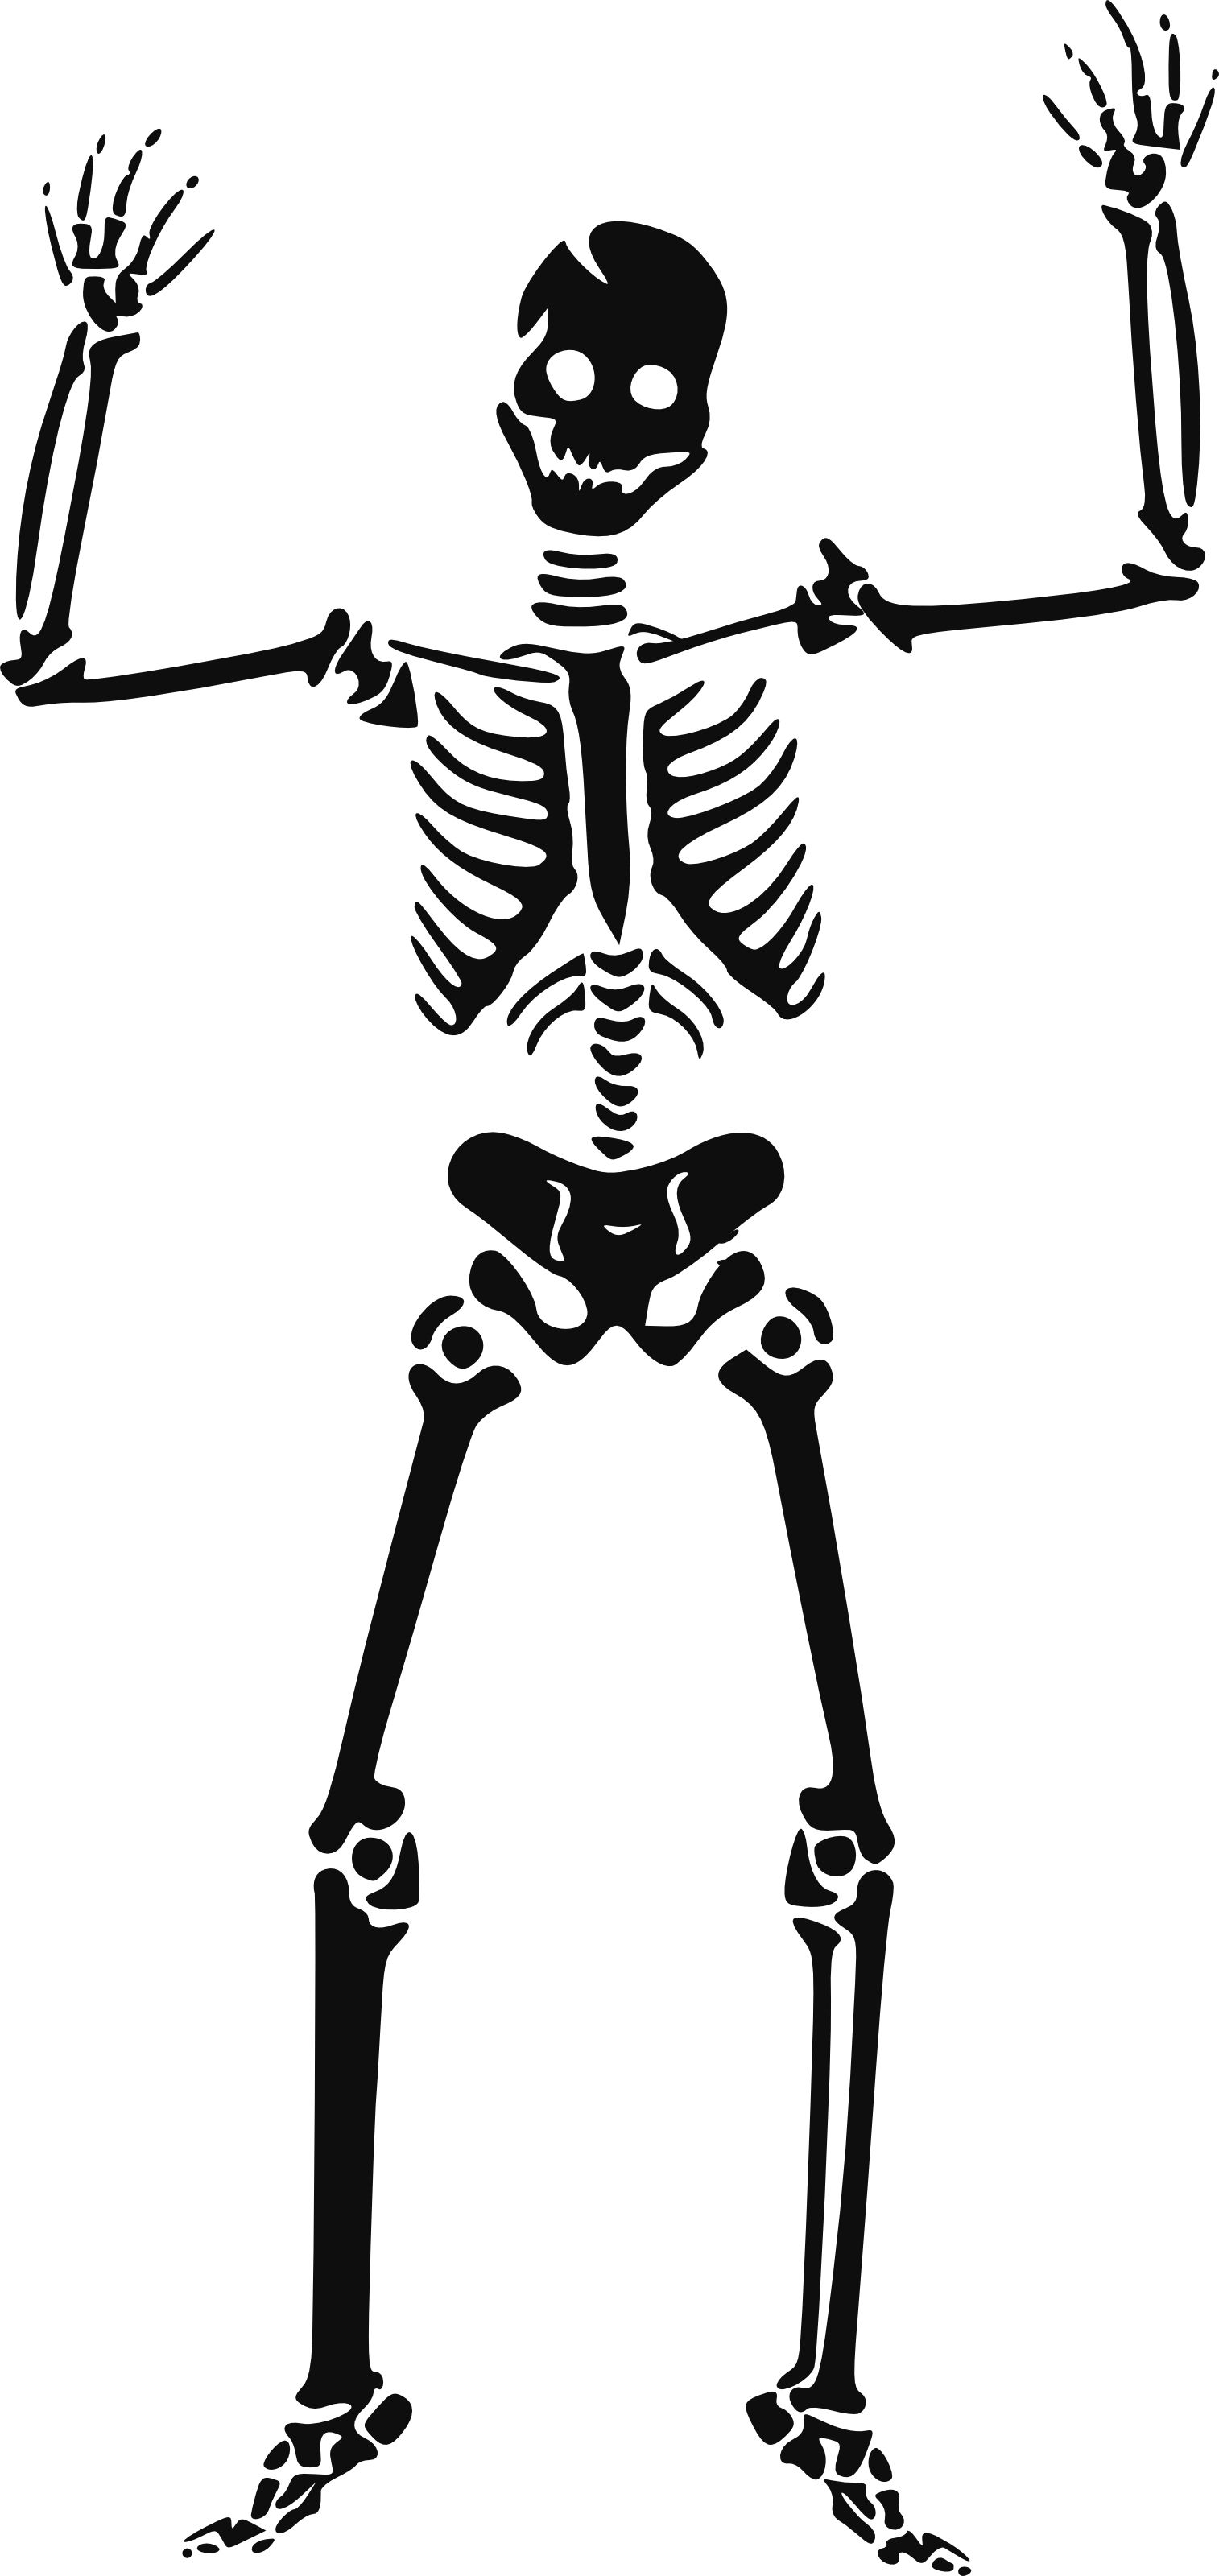 medium resolution of 117 happy skeleton free halloween vector clipart illustration